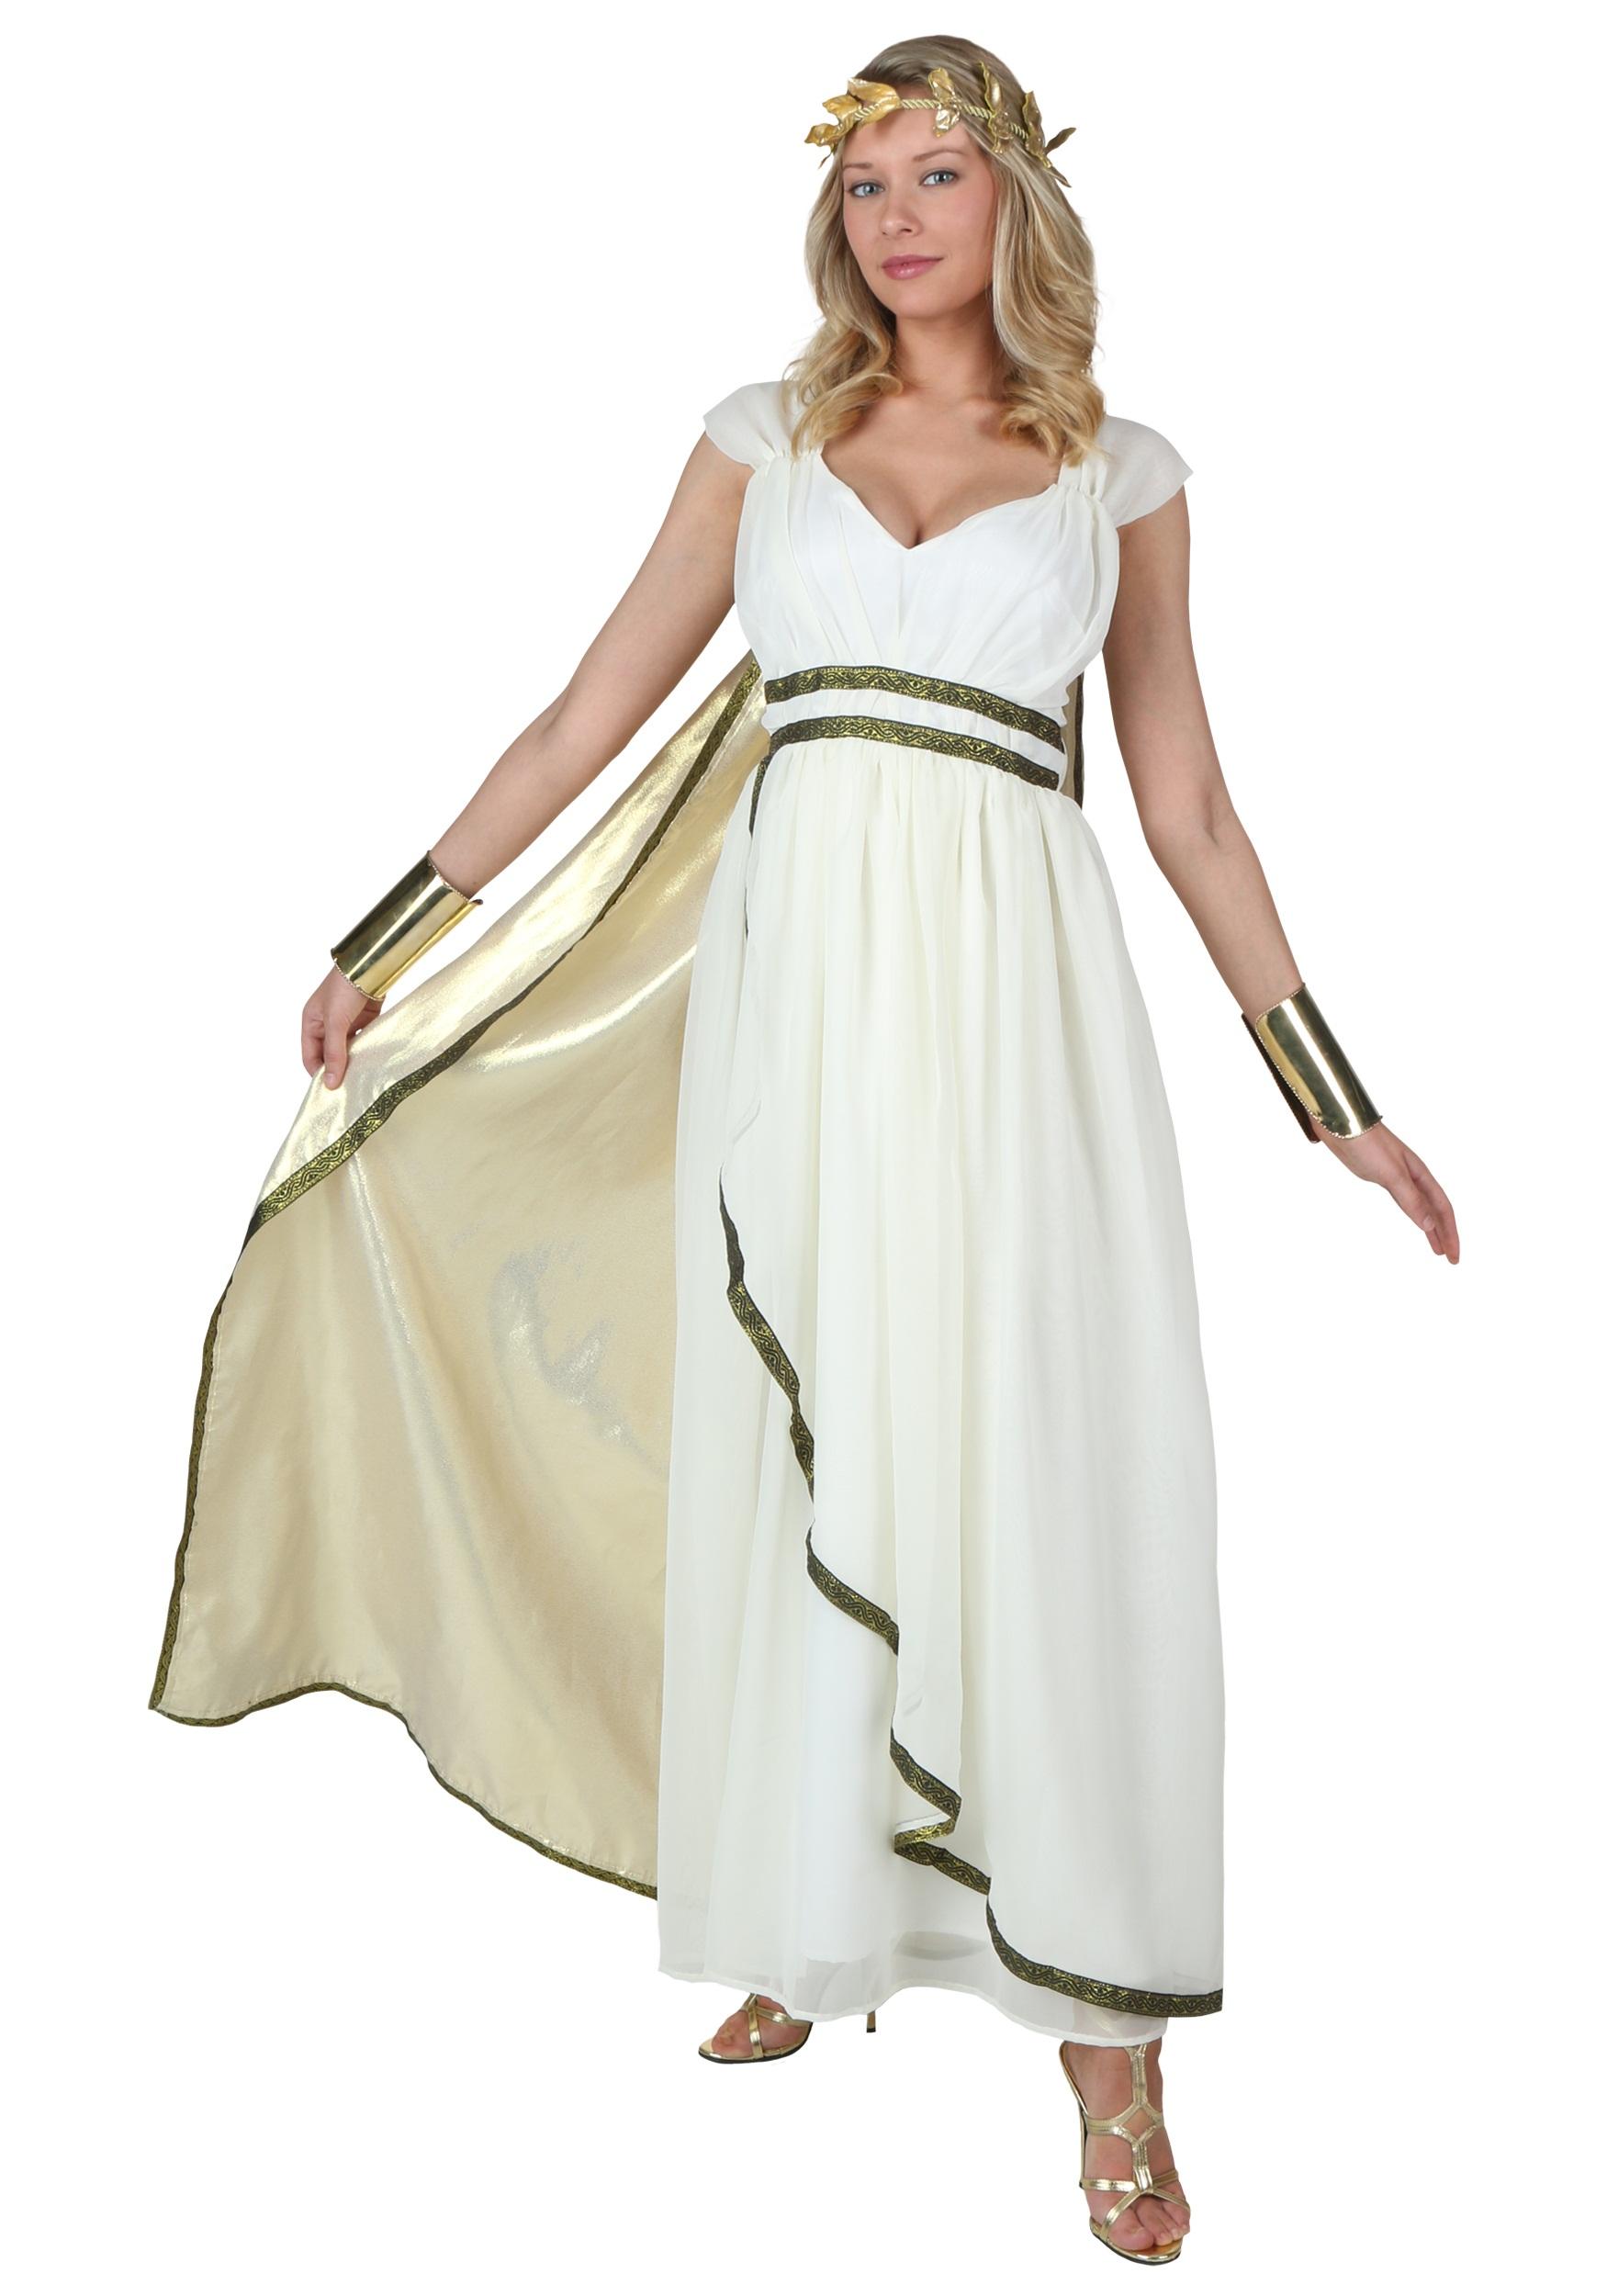 a84f0fe39b8 Goddess Plus Size Costume